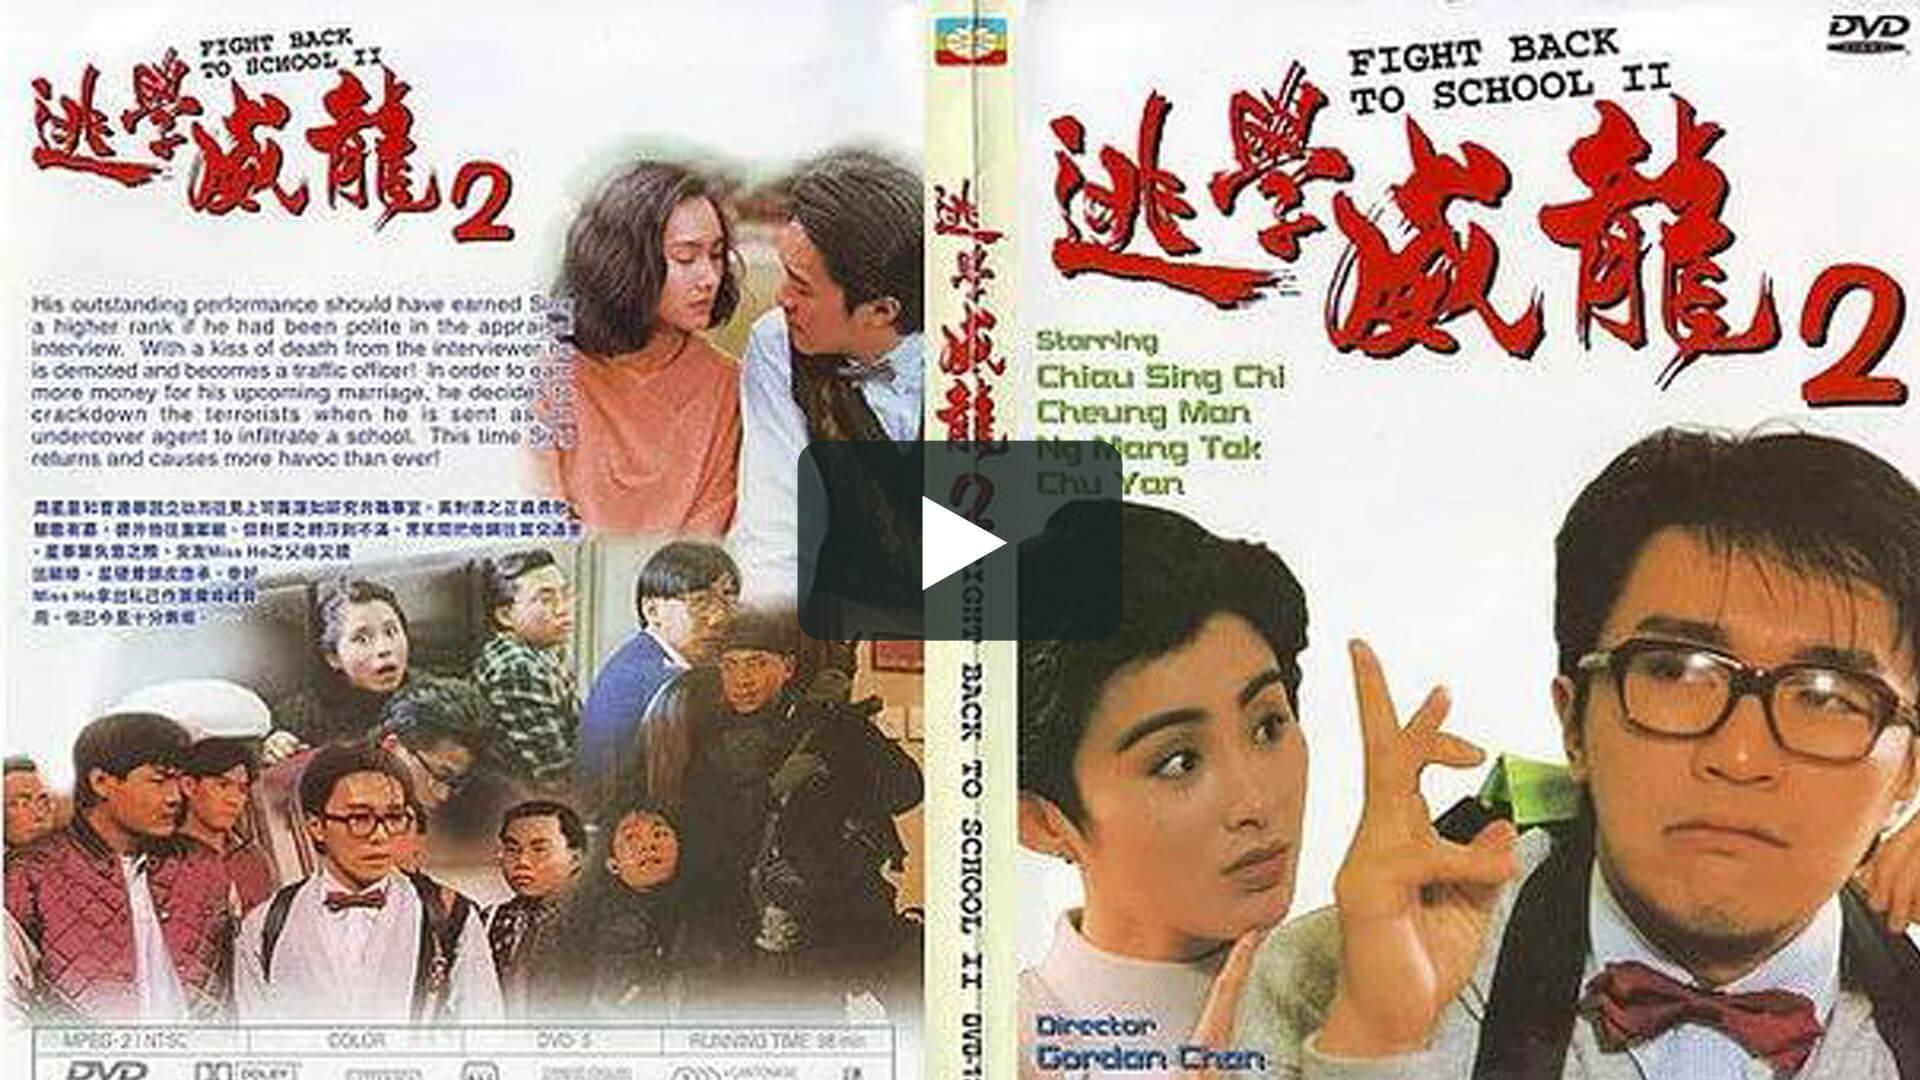 逃學威龍2 -  Fight Back to School II